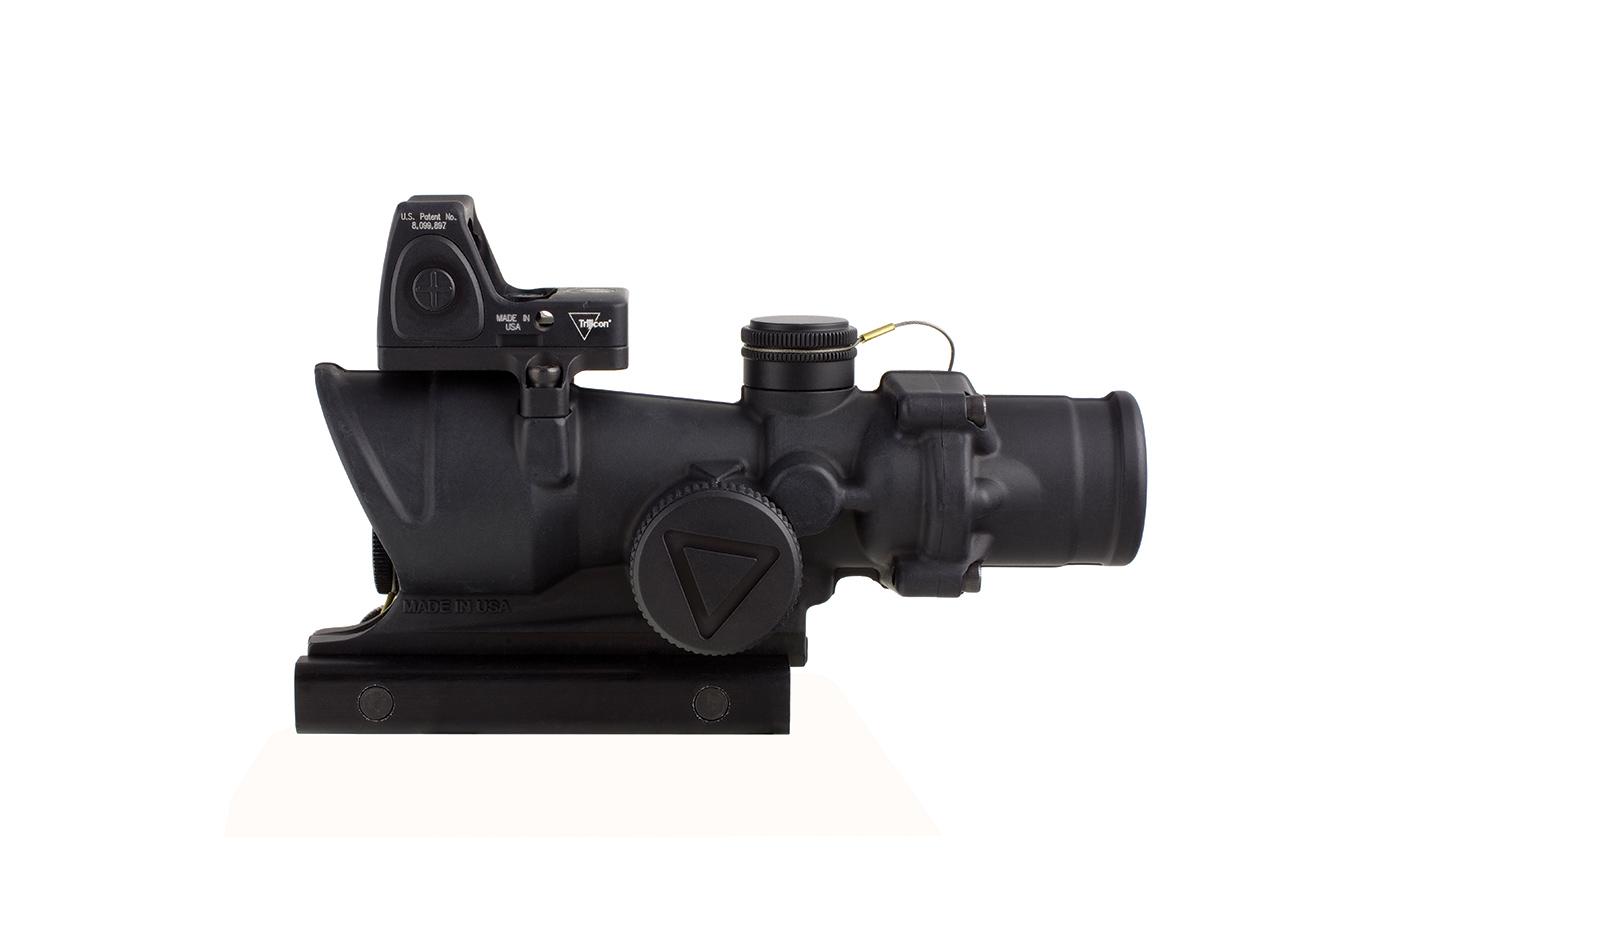 TA02-C-100564 angle 2